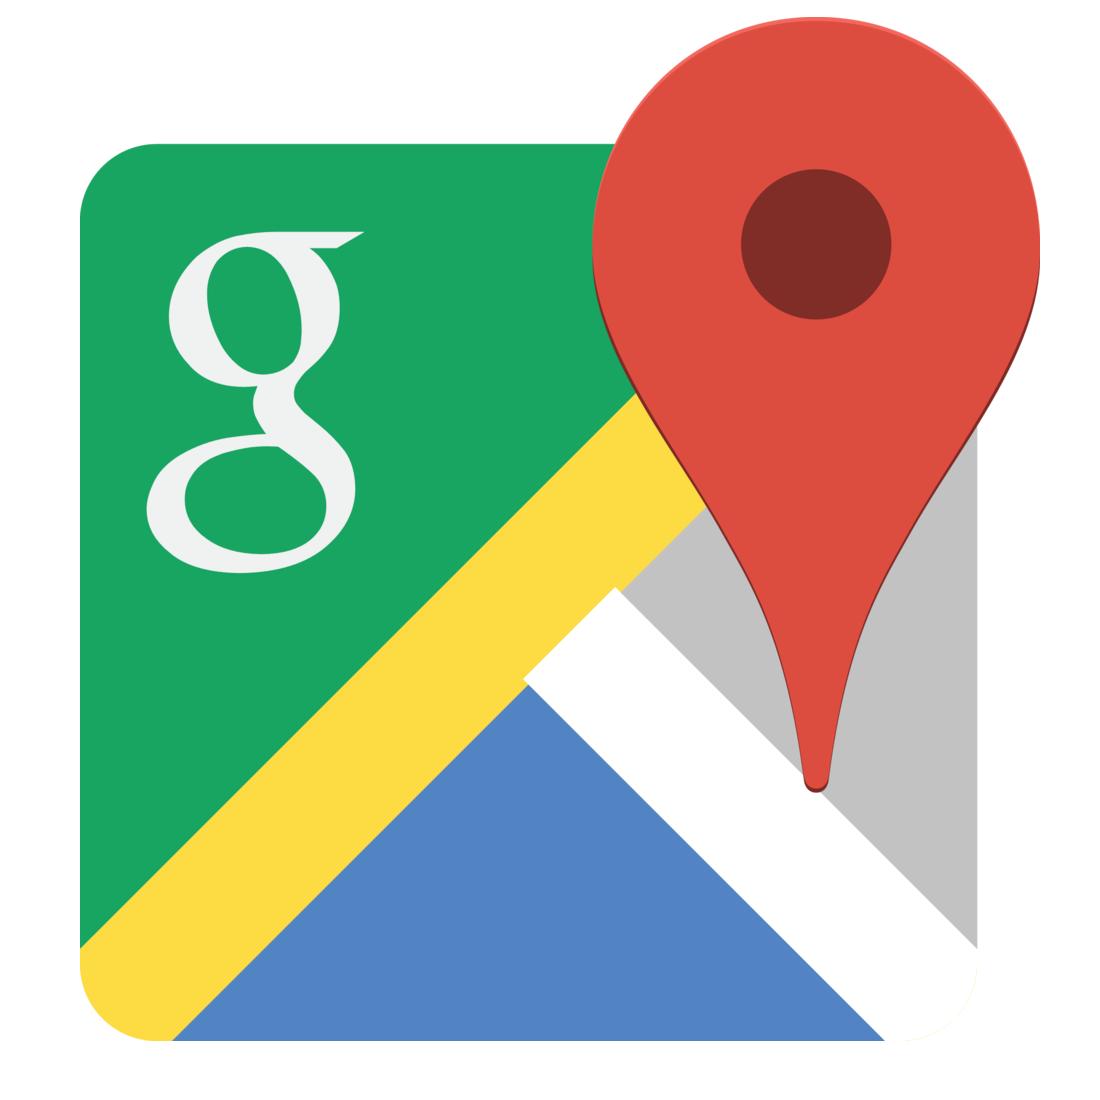 Logos . Maps clipart pin map